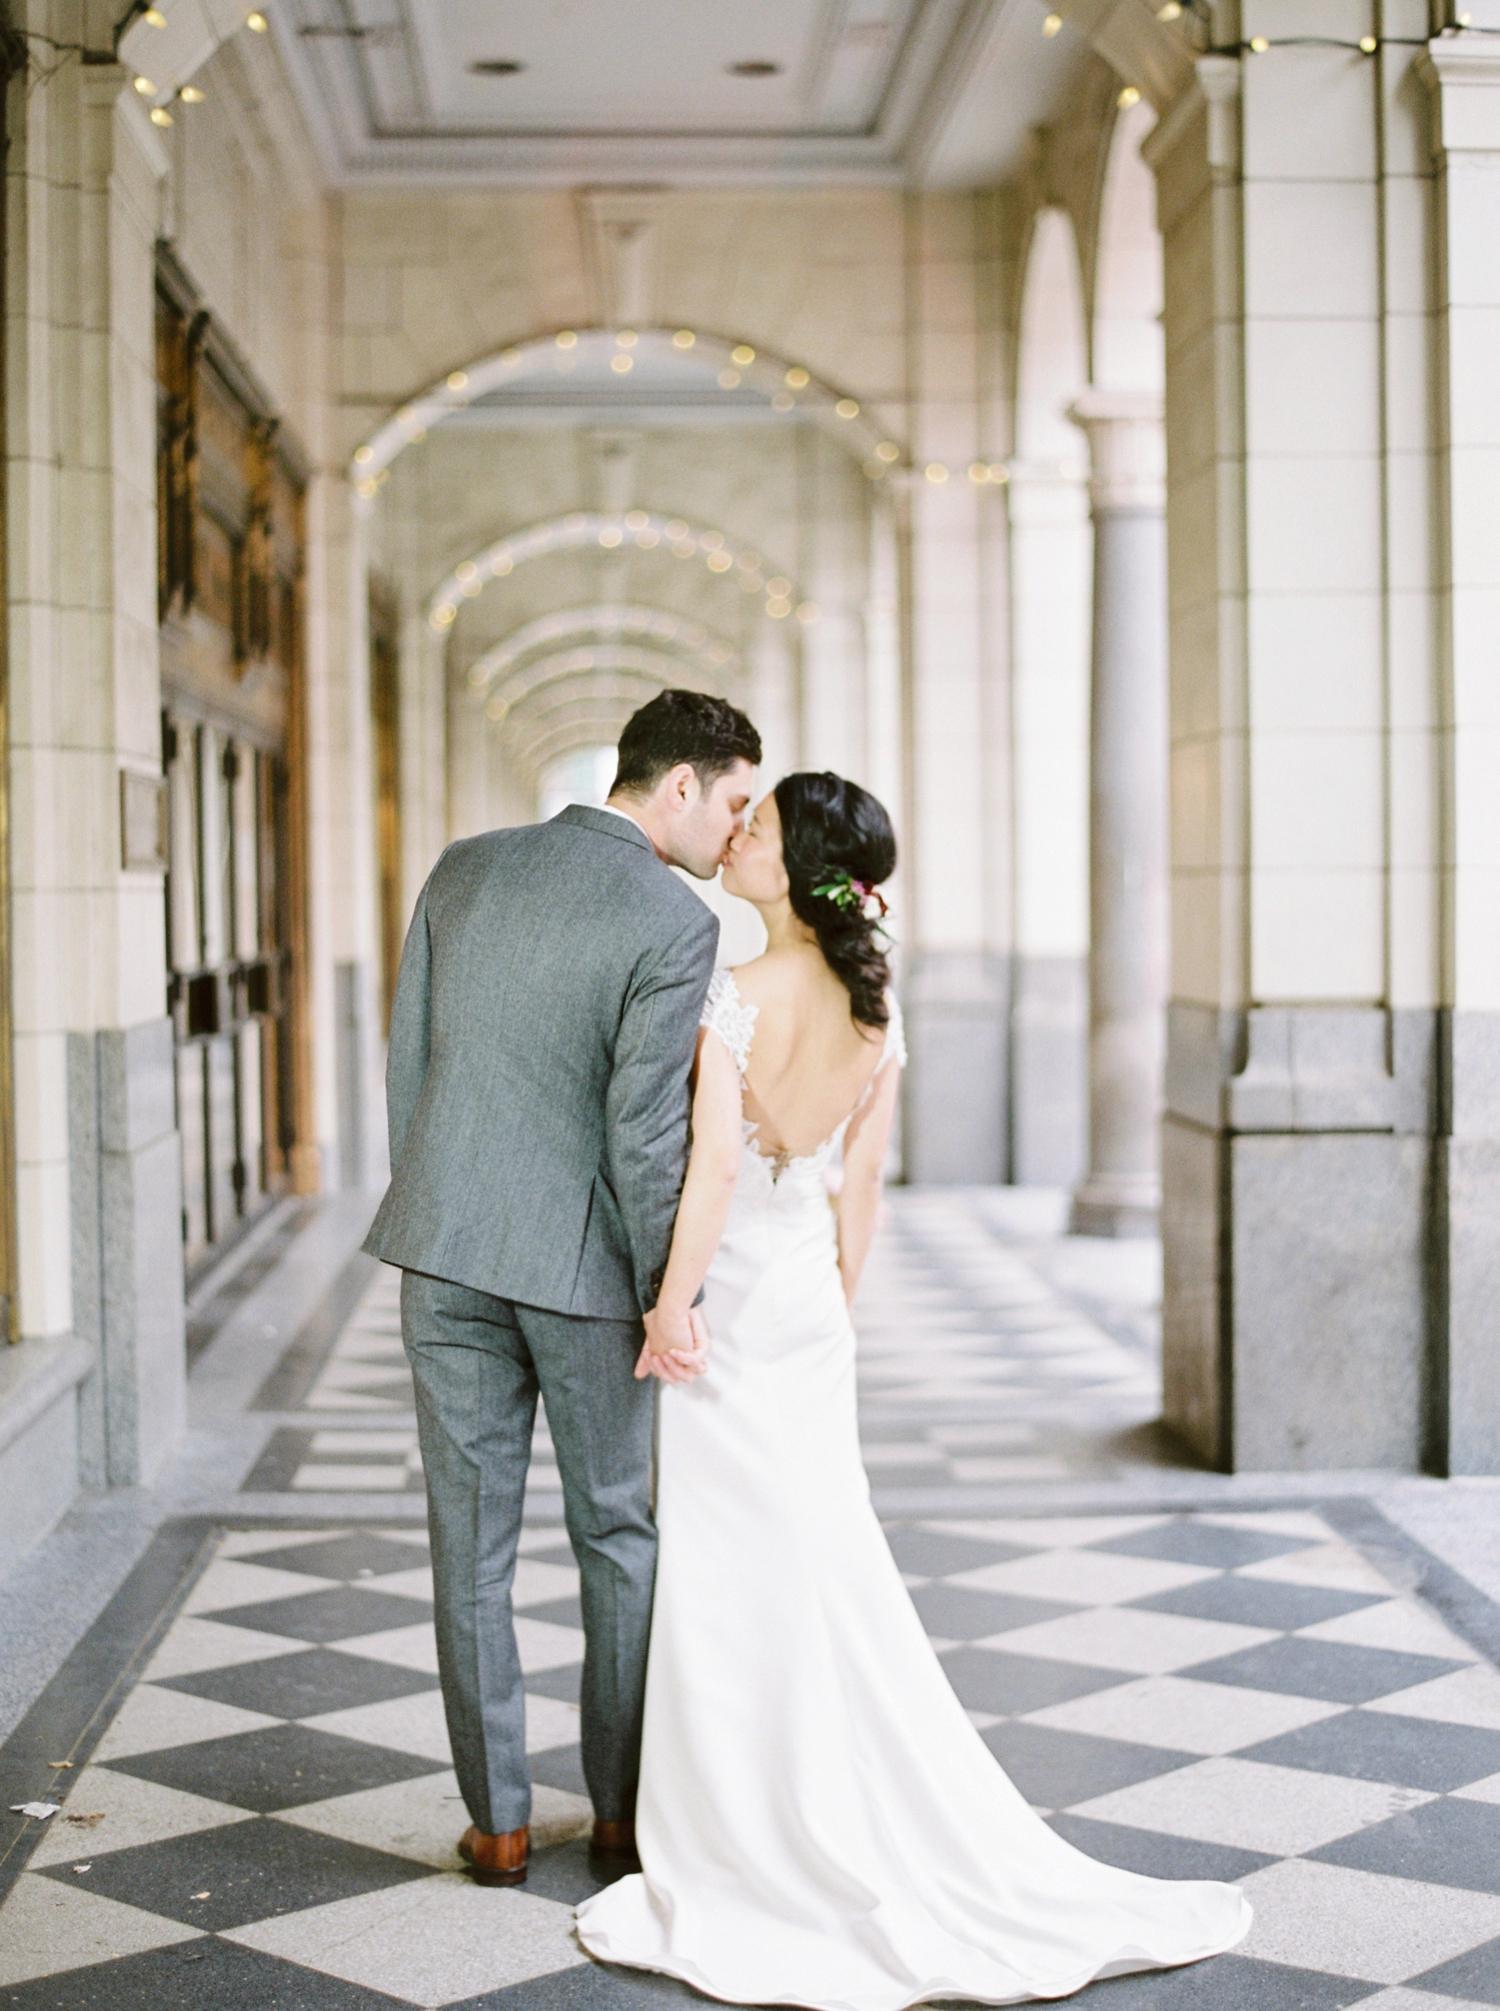 Calgary wedding photographer | fine art film photography | Calgary Wedding Photographers | Justine Milton Photography | workshop wedding | bride and groom portraits | wedding dress